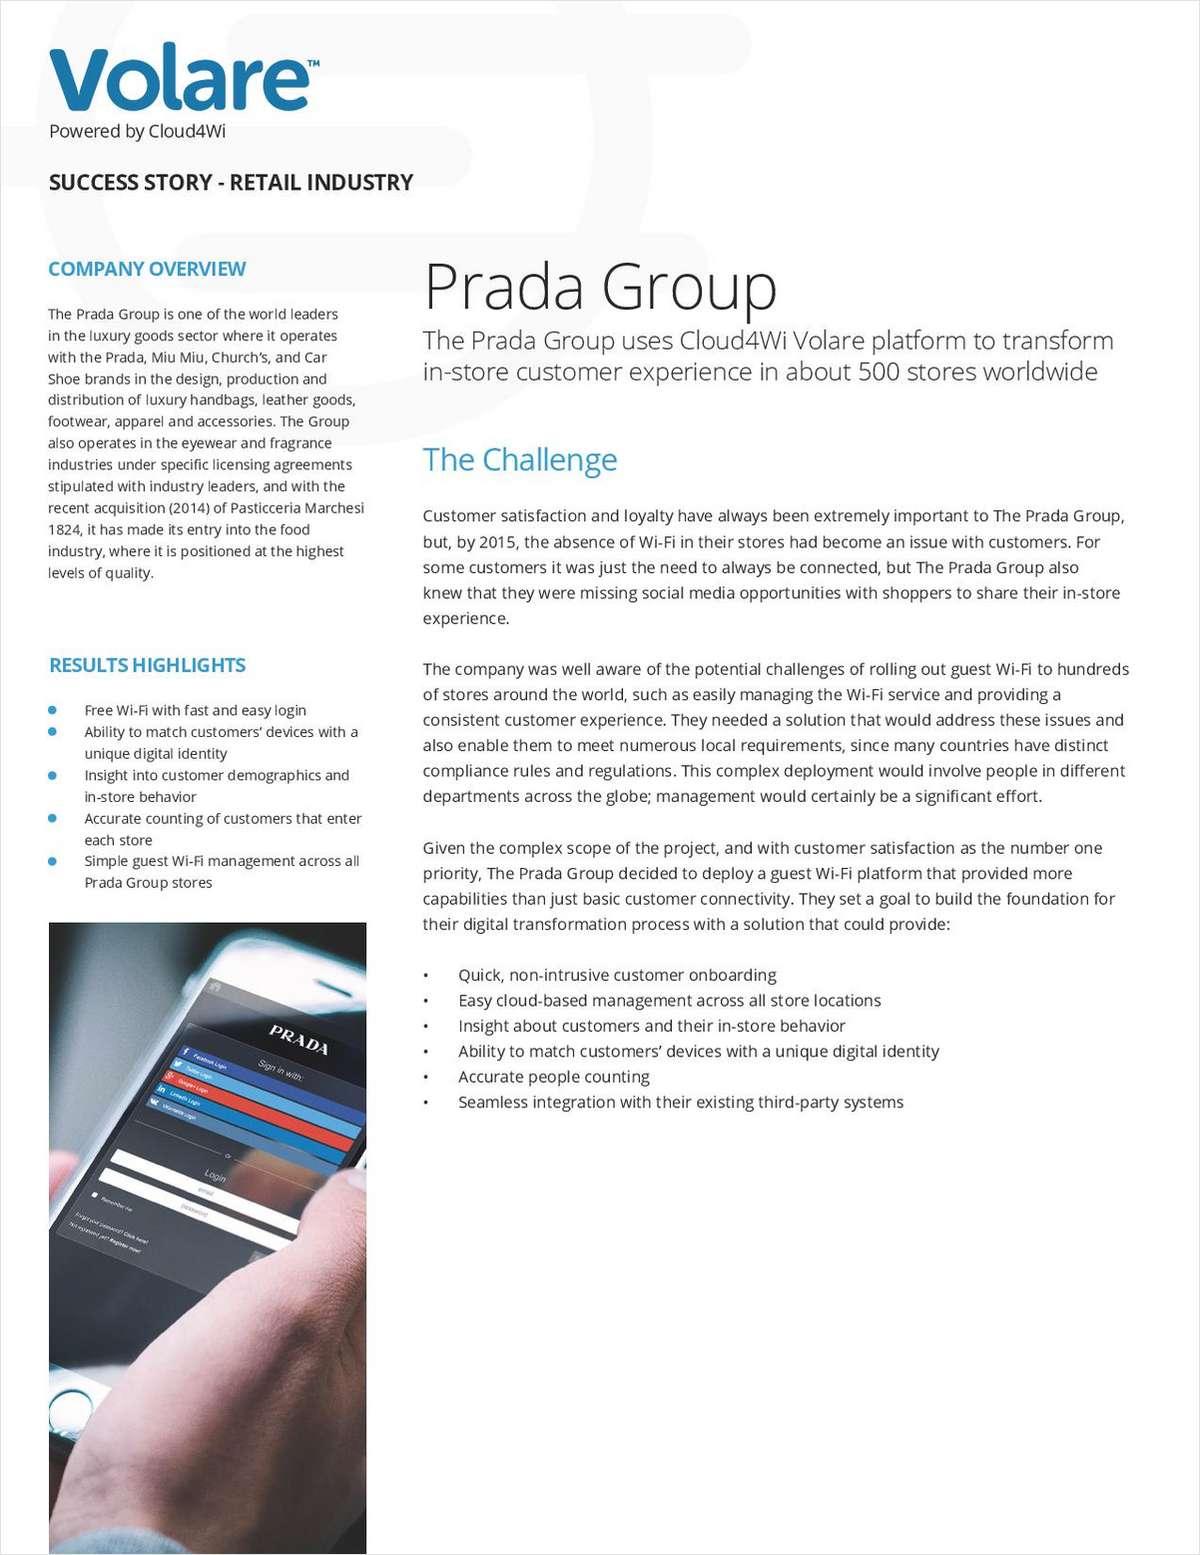 Revolutionizing In-Store Customer Experience: Prada Group Success Story